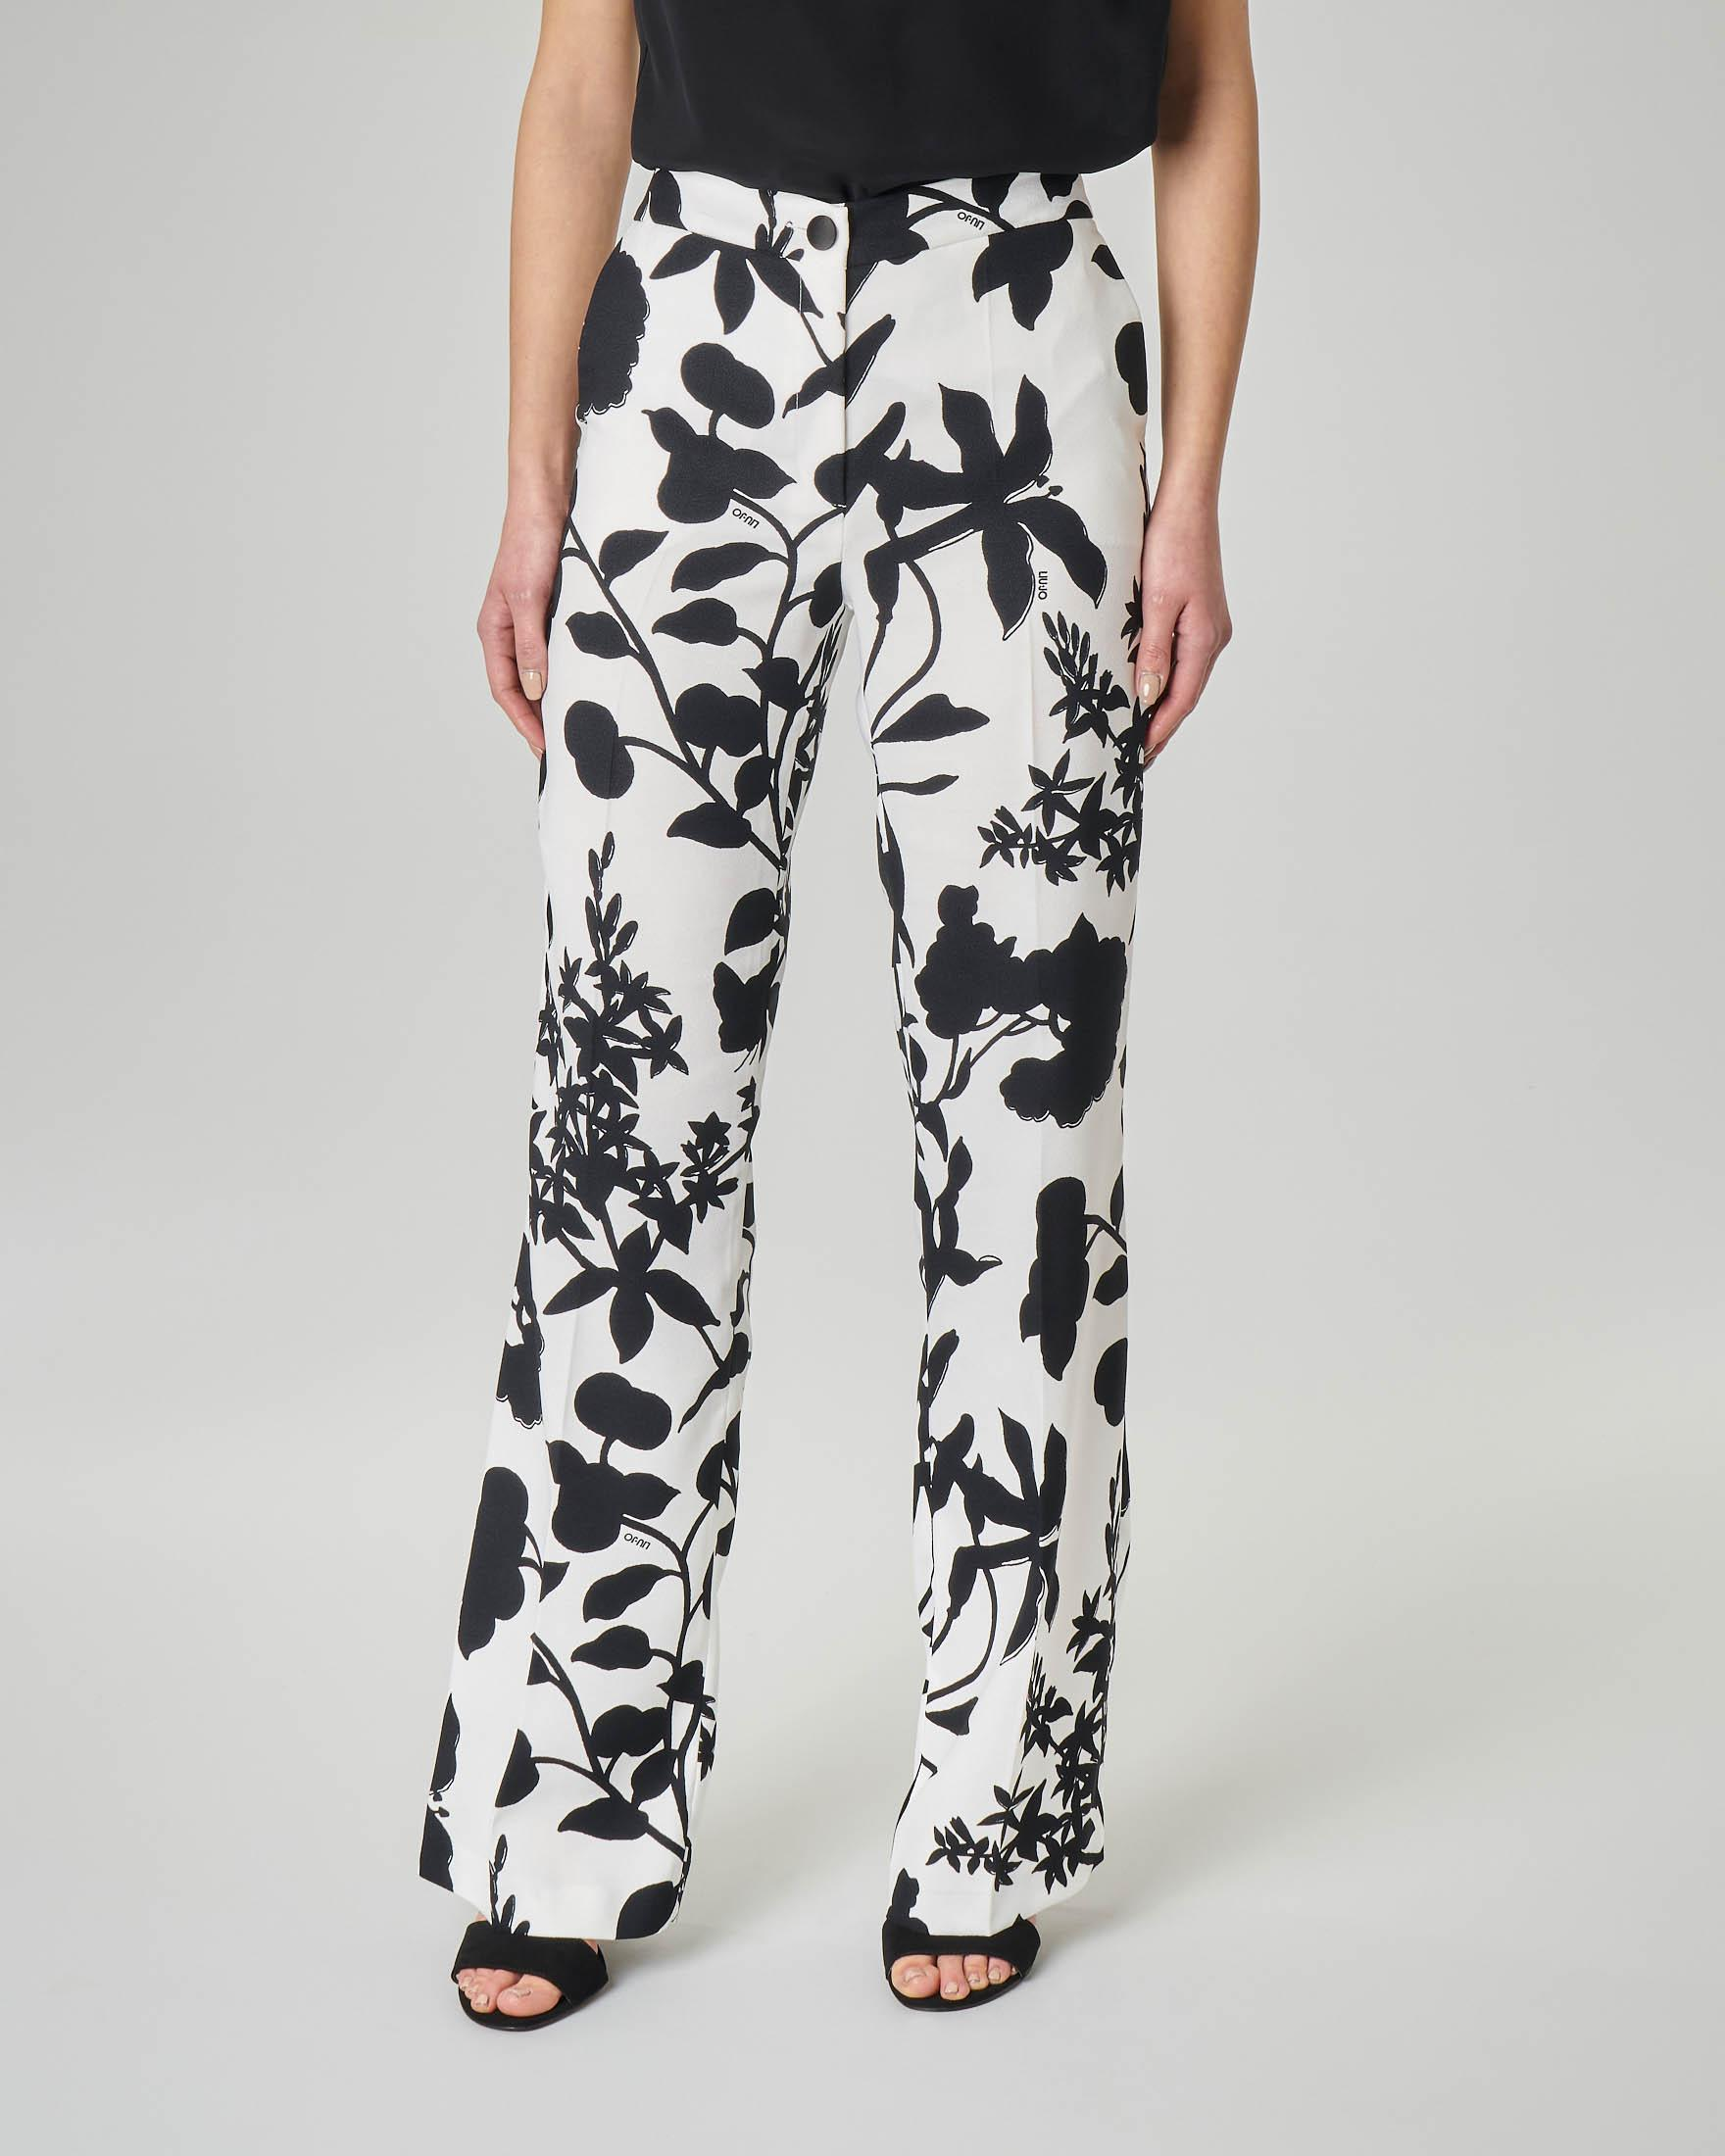 Pantaloni palazzo a fantasia floreale bianca e nera